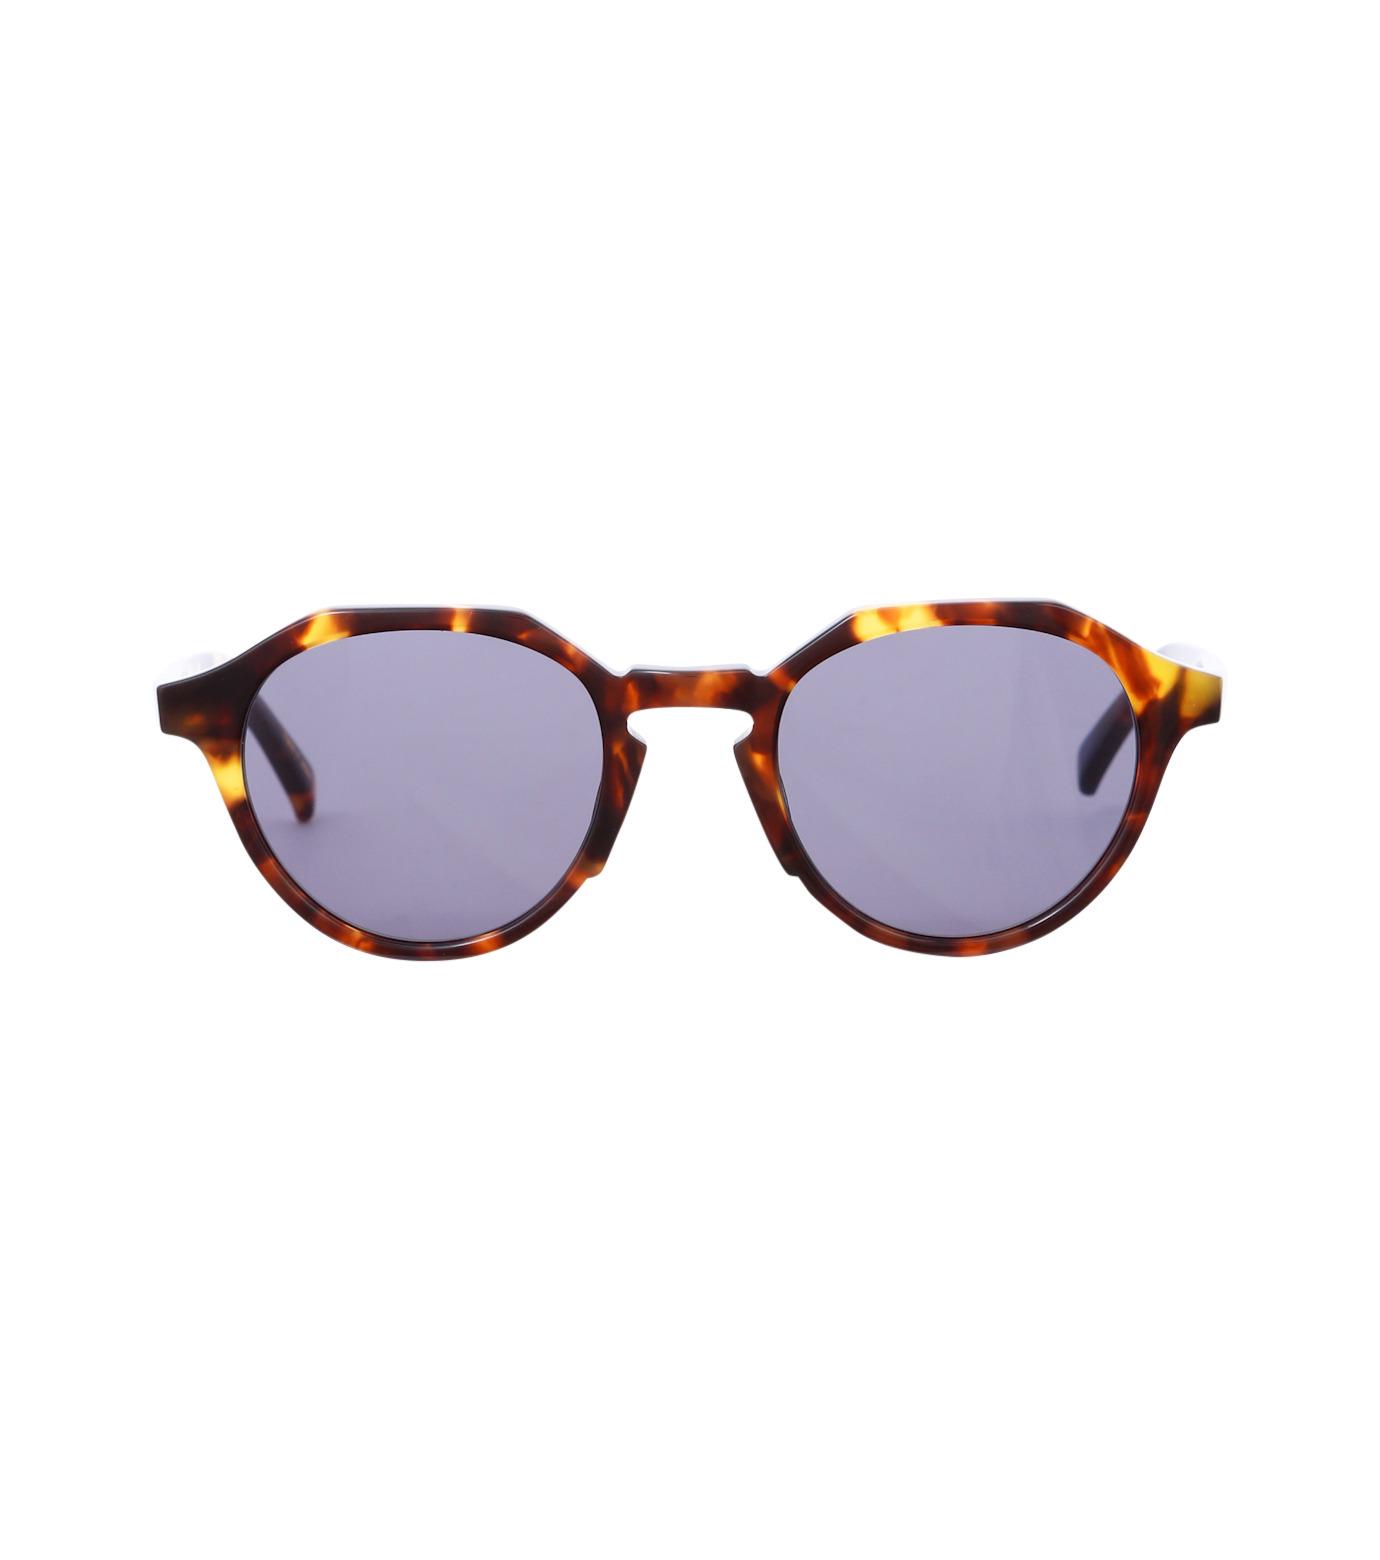 BLANC(ブラン)のOctagon Sunglass-BROWN(アイウェア/eyewear)-BM001-42 拡大詳細画像3